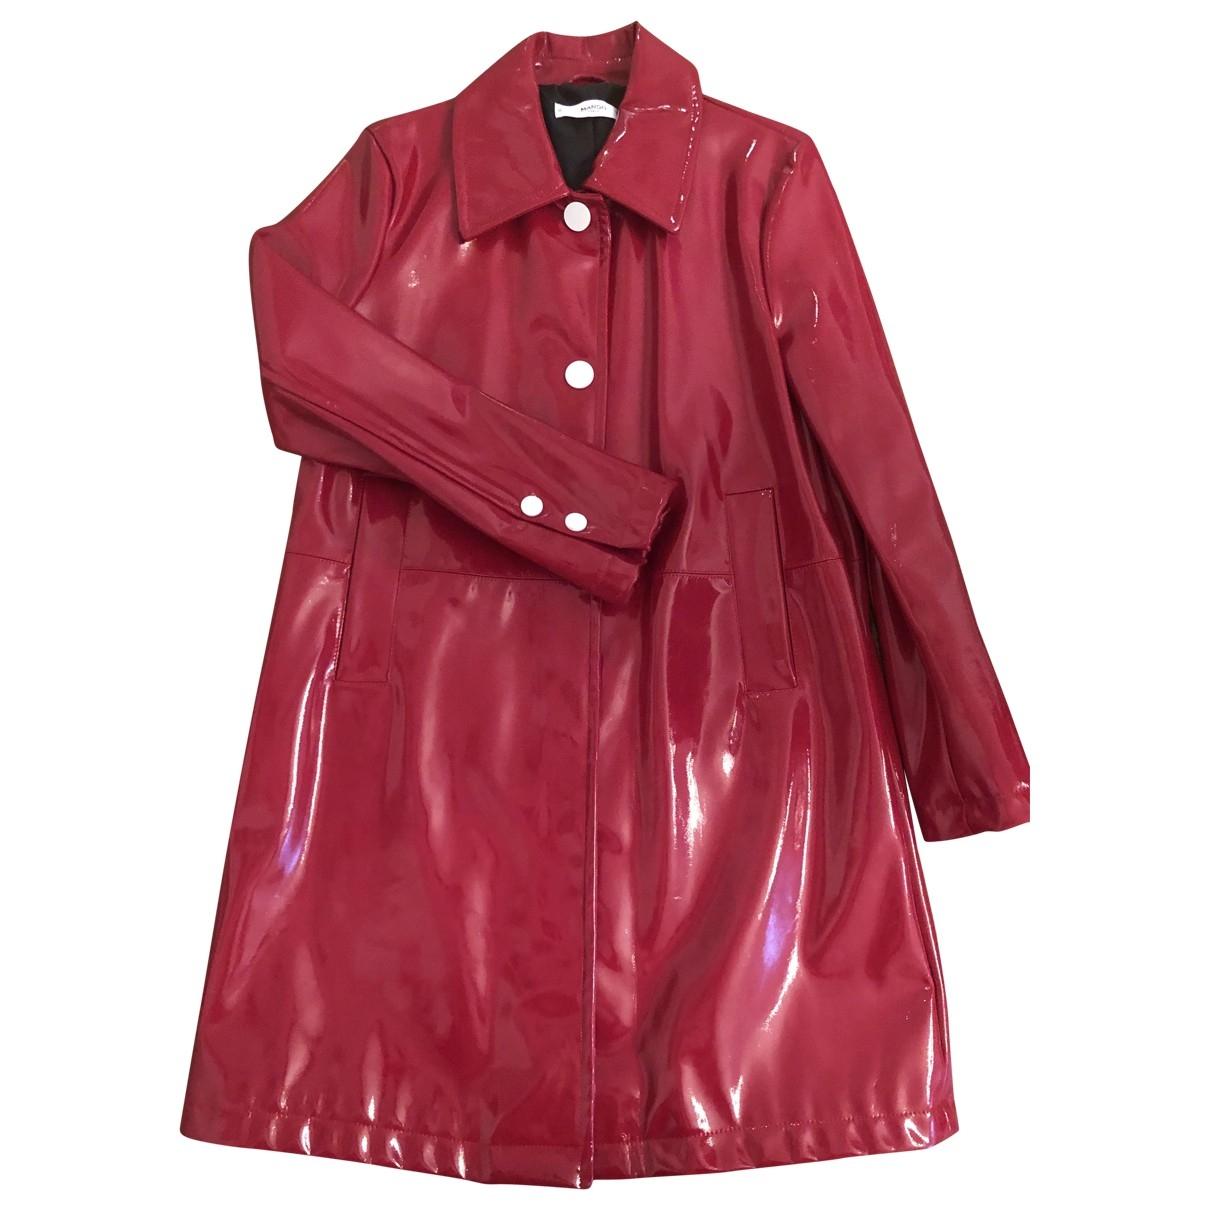 Mango \N Red coat for Women M International